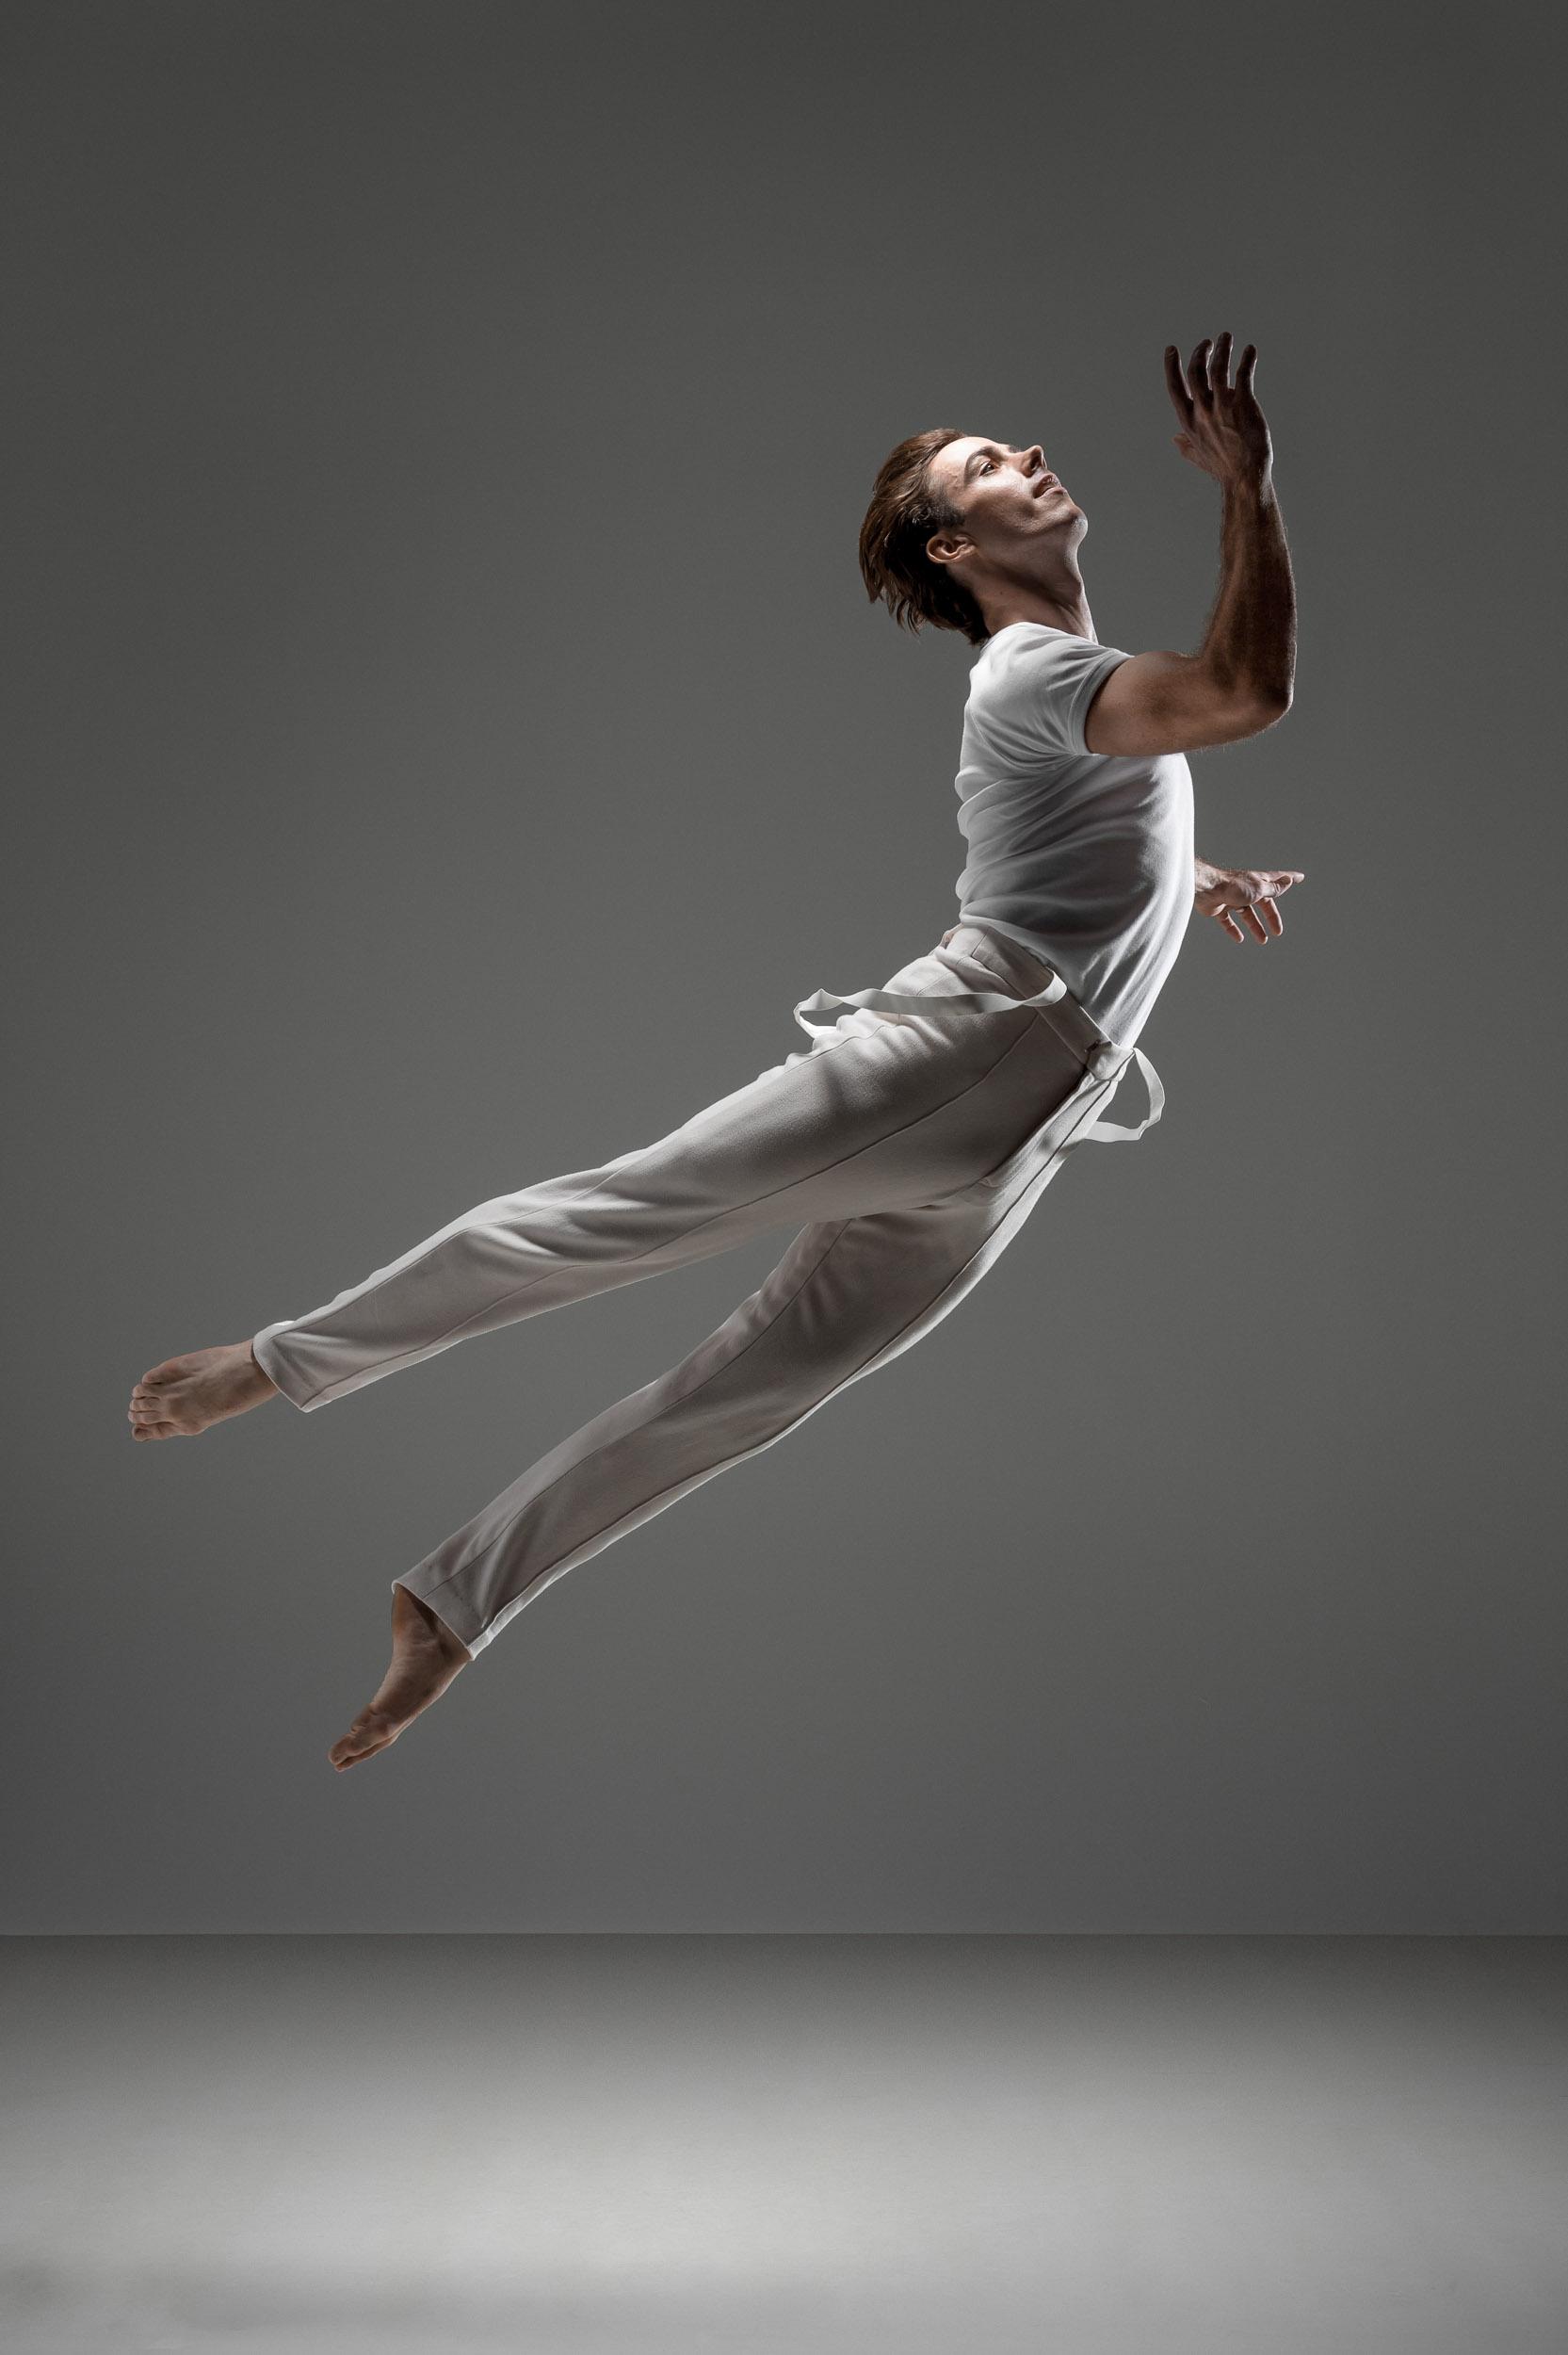 Rudy Hawkes - The Australian Ballet